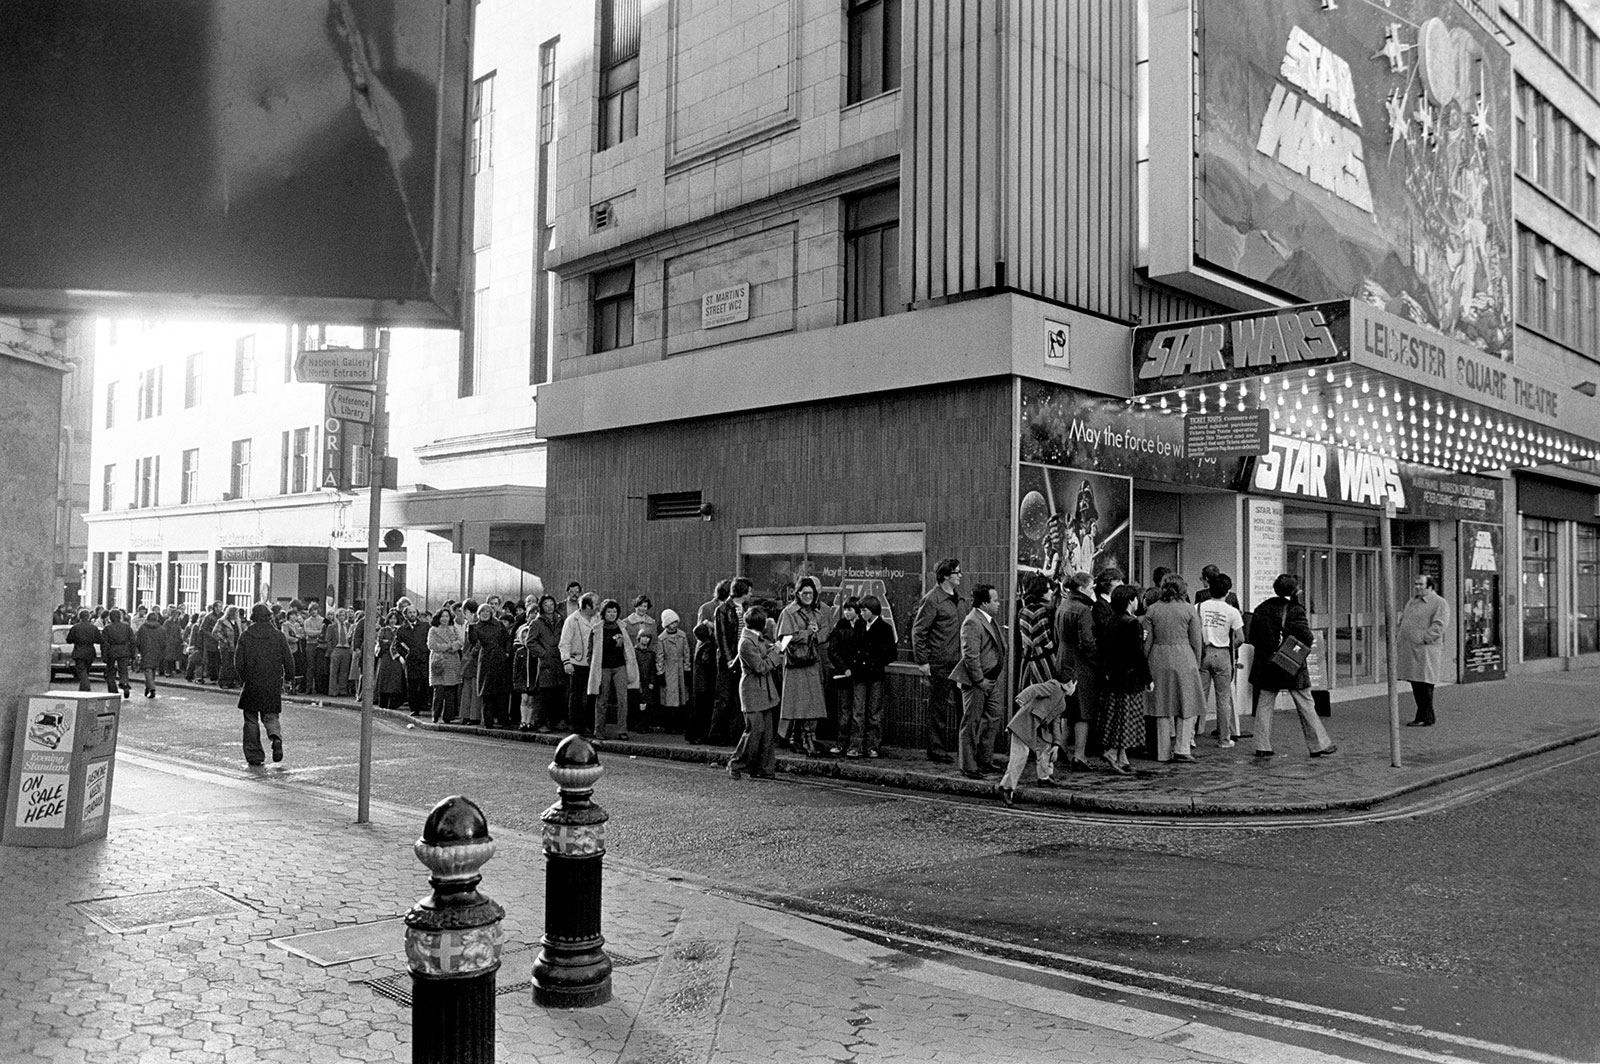 Star Wars Theater Lines Vintage 10